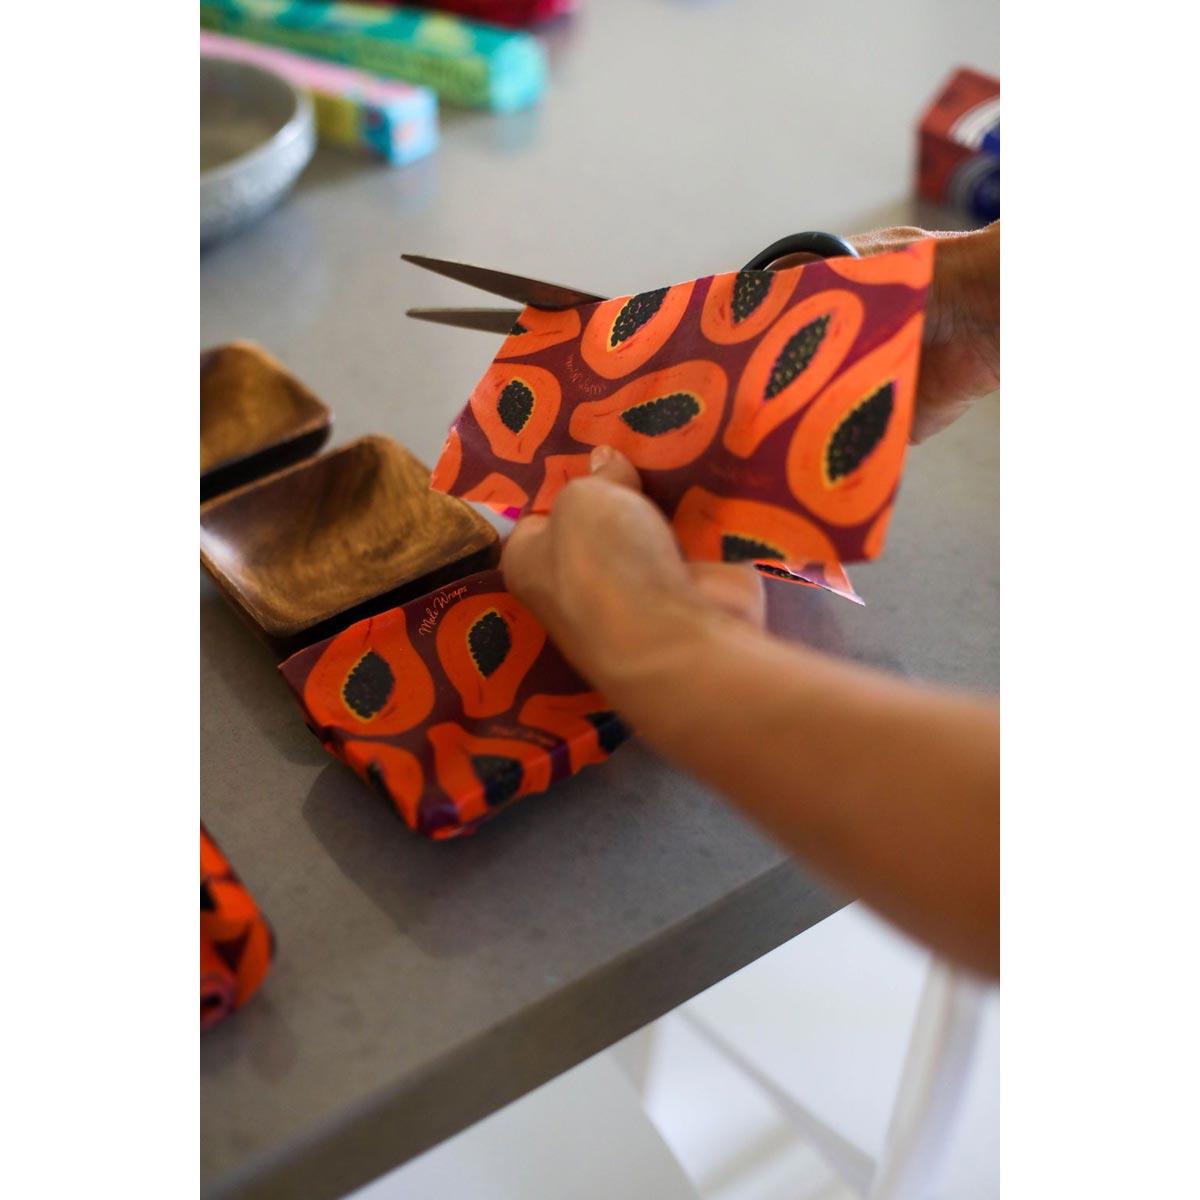 Meli Wraps Bulk Roll (42 in. x 13.5 in.) Reusable Beeswax Food Wrap, Purple Papaya Print